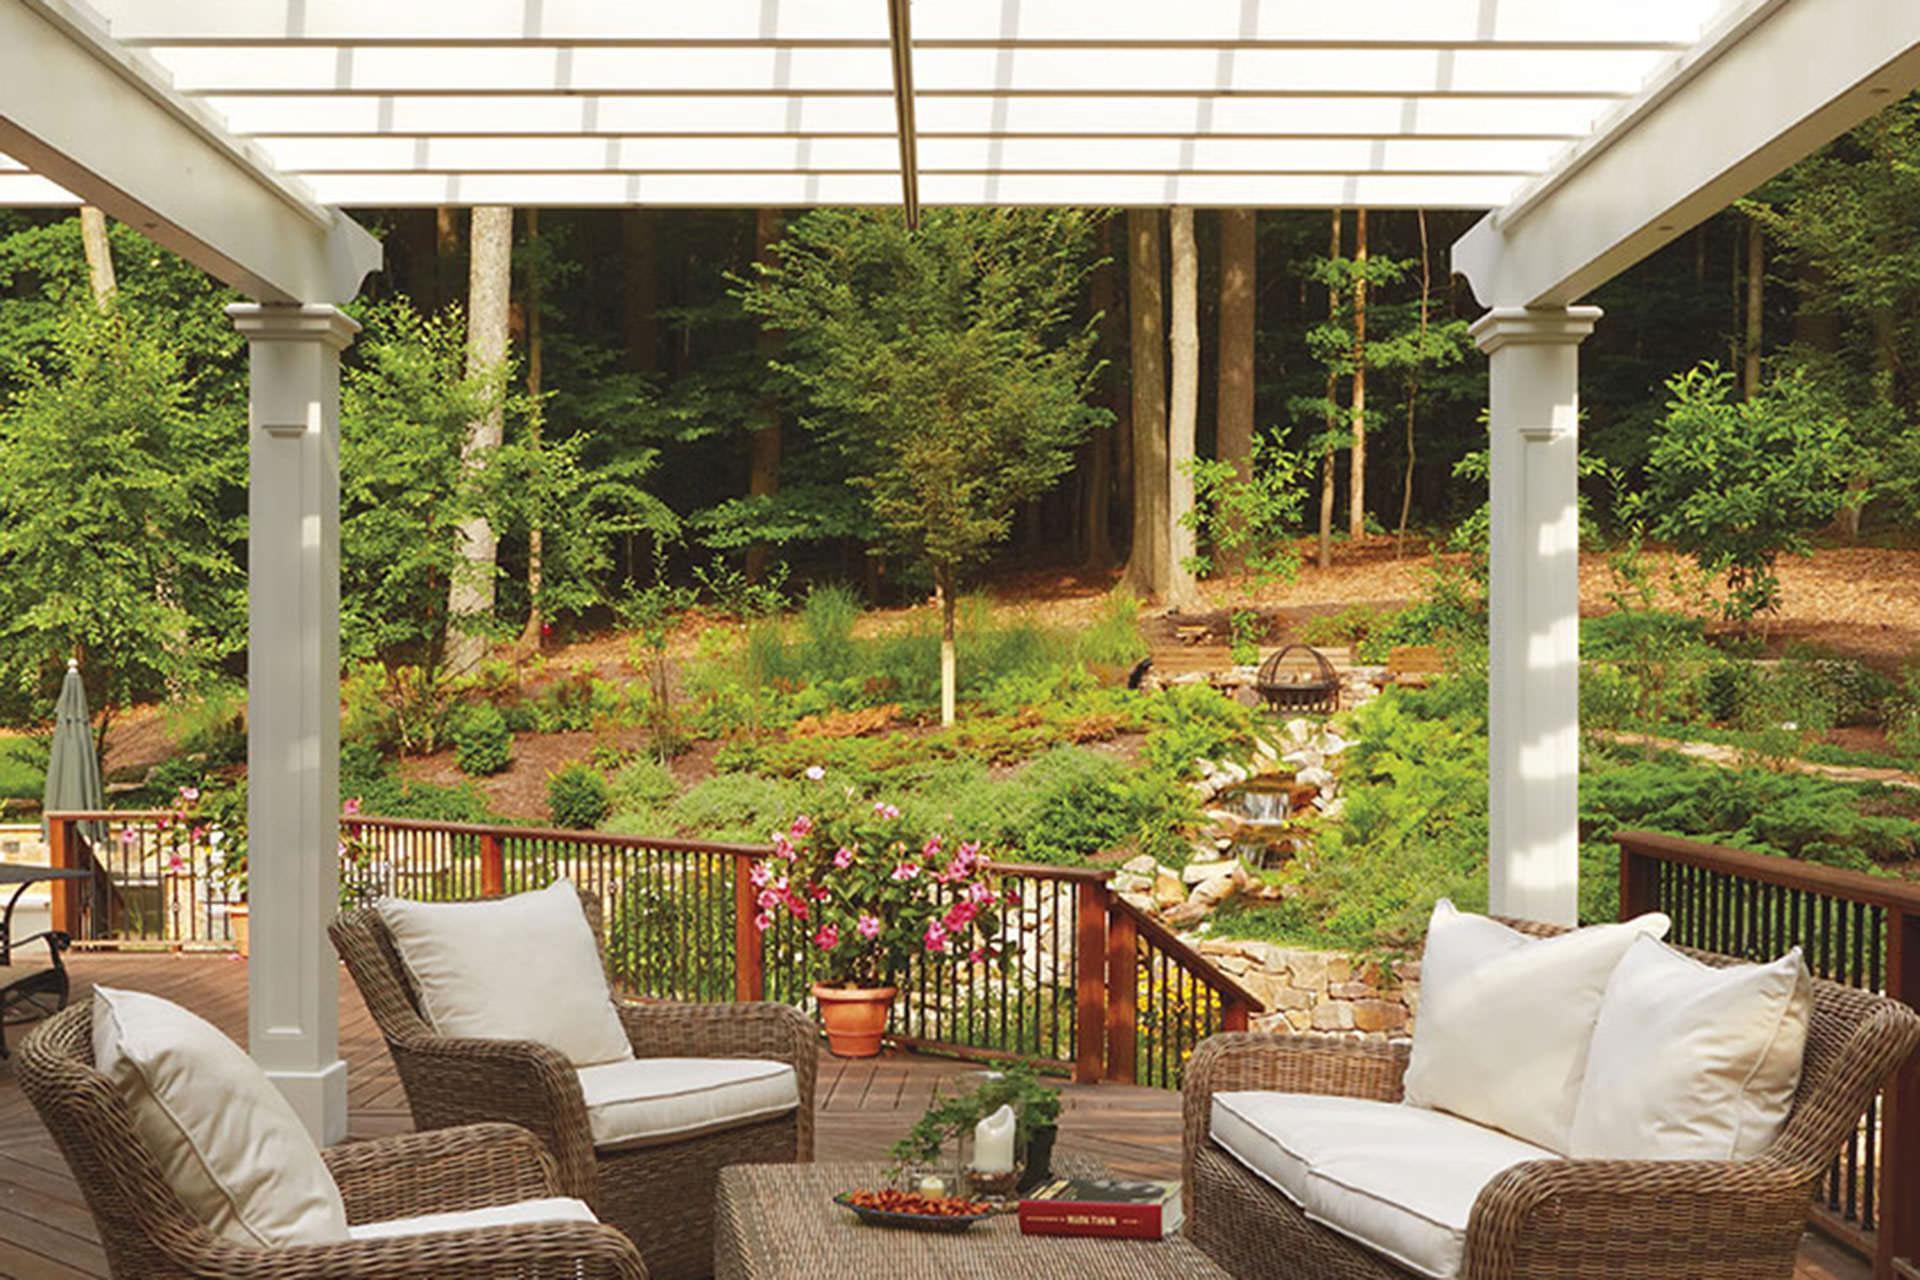 Retractable Pergola Canopy in Morris Plains | ShadeFX Canopies